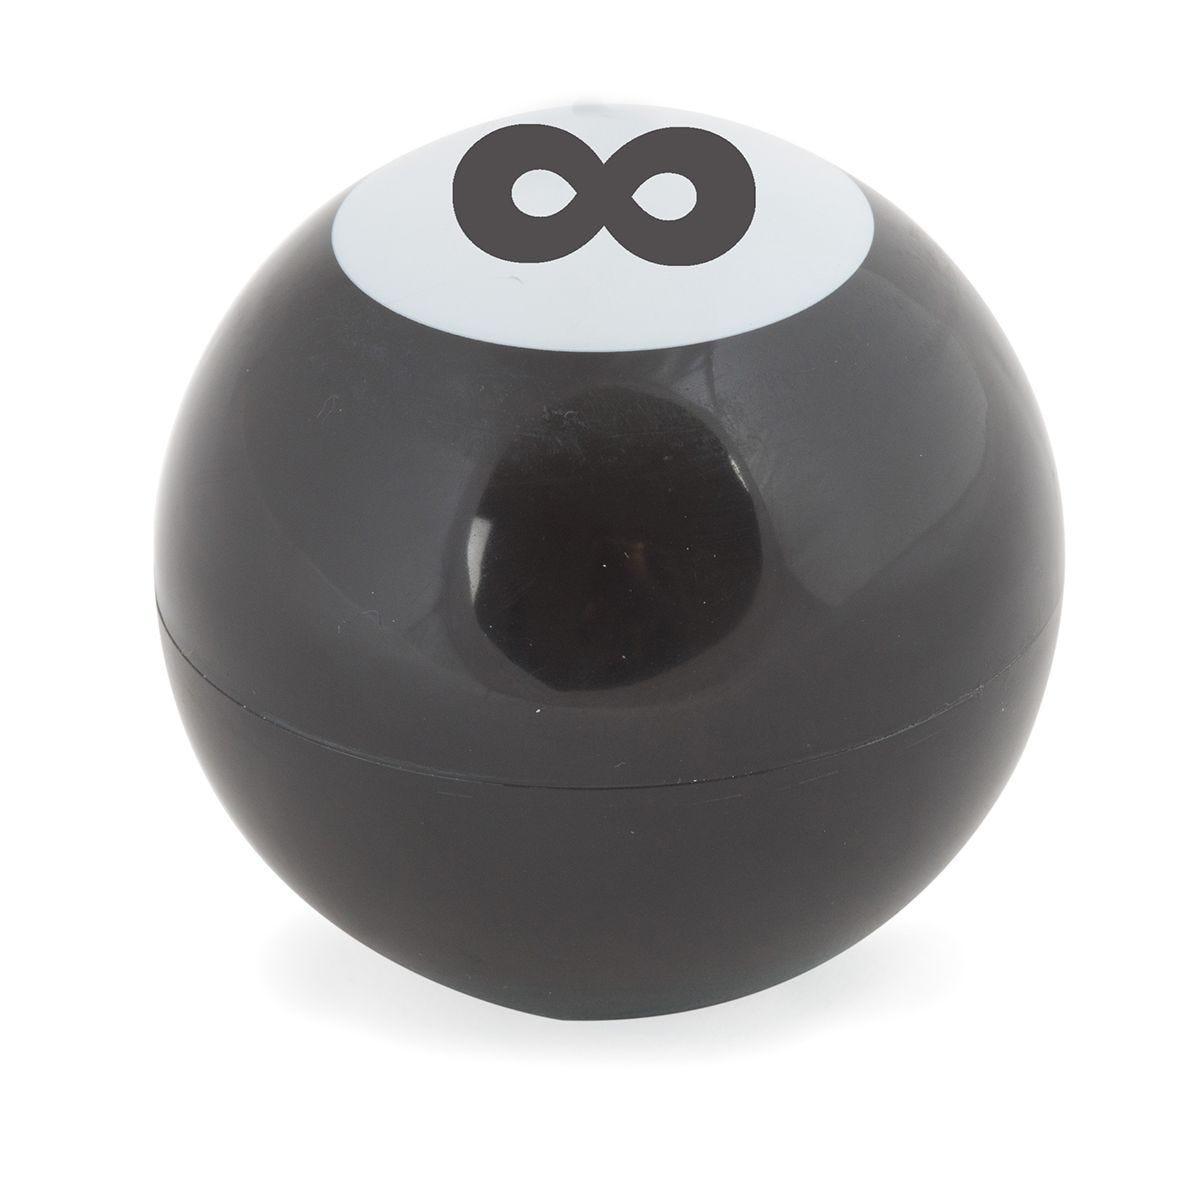 Funtime Mystic Infinity Ball